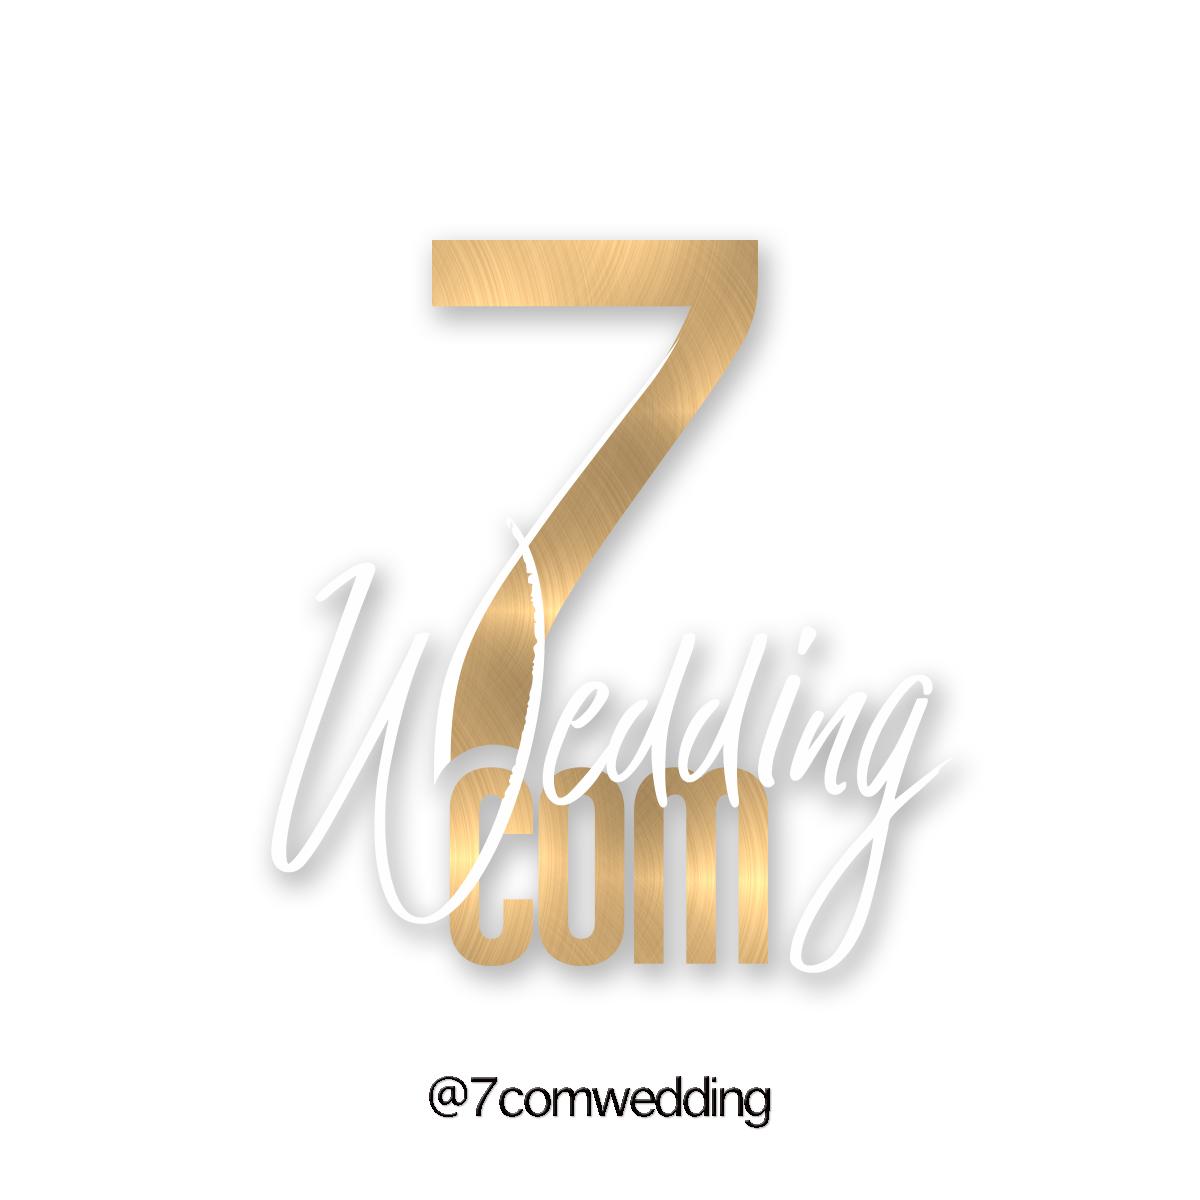 7com-wedding @.jpg